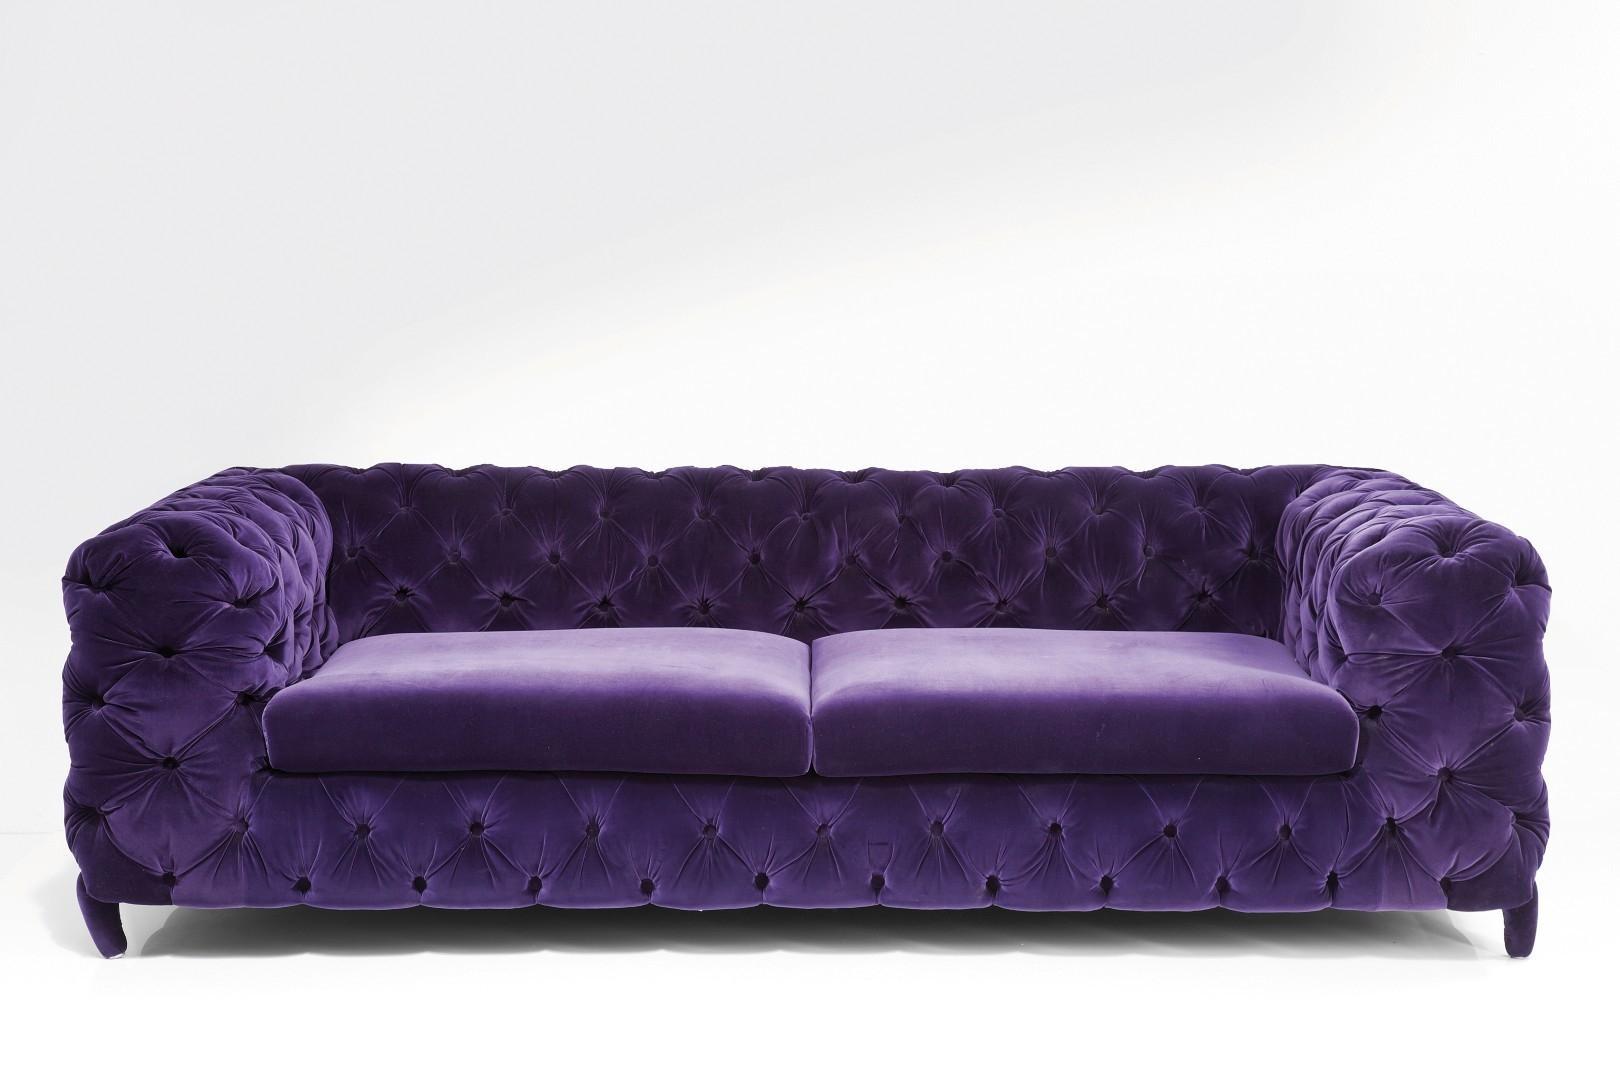 purple velvet sleeper sofa darwin gumtree 20 inspirations sofas ideas